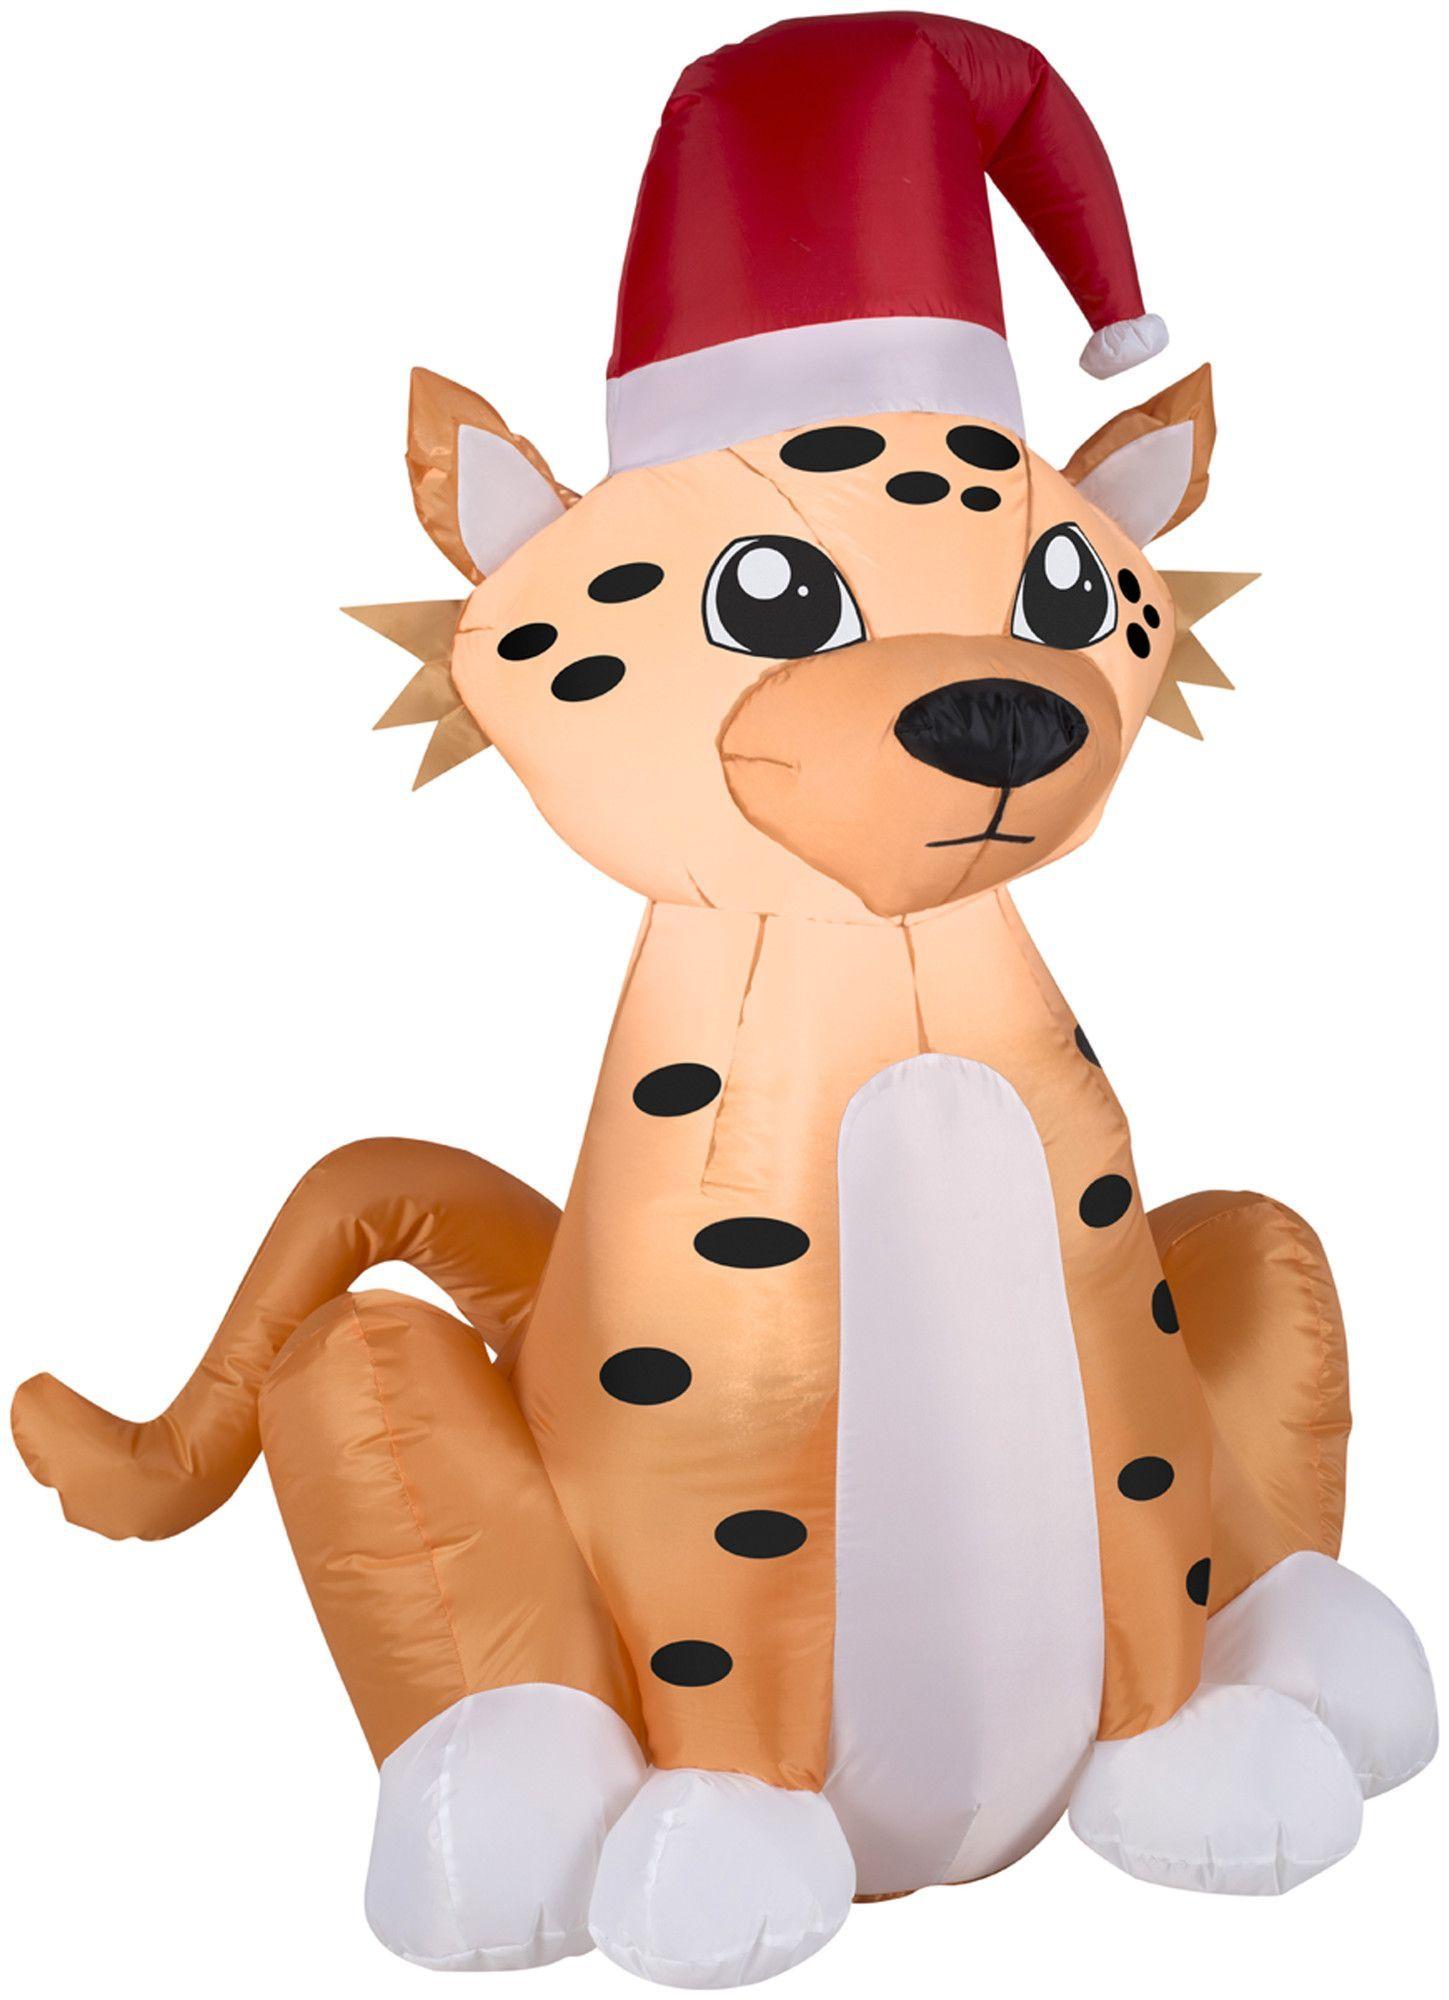 Airblown Inflatables Christmas Cheetah with Santa Hat